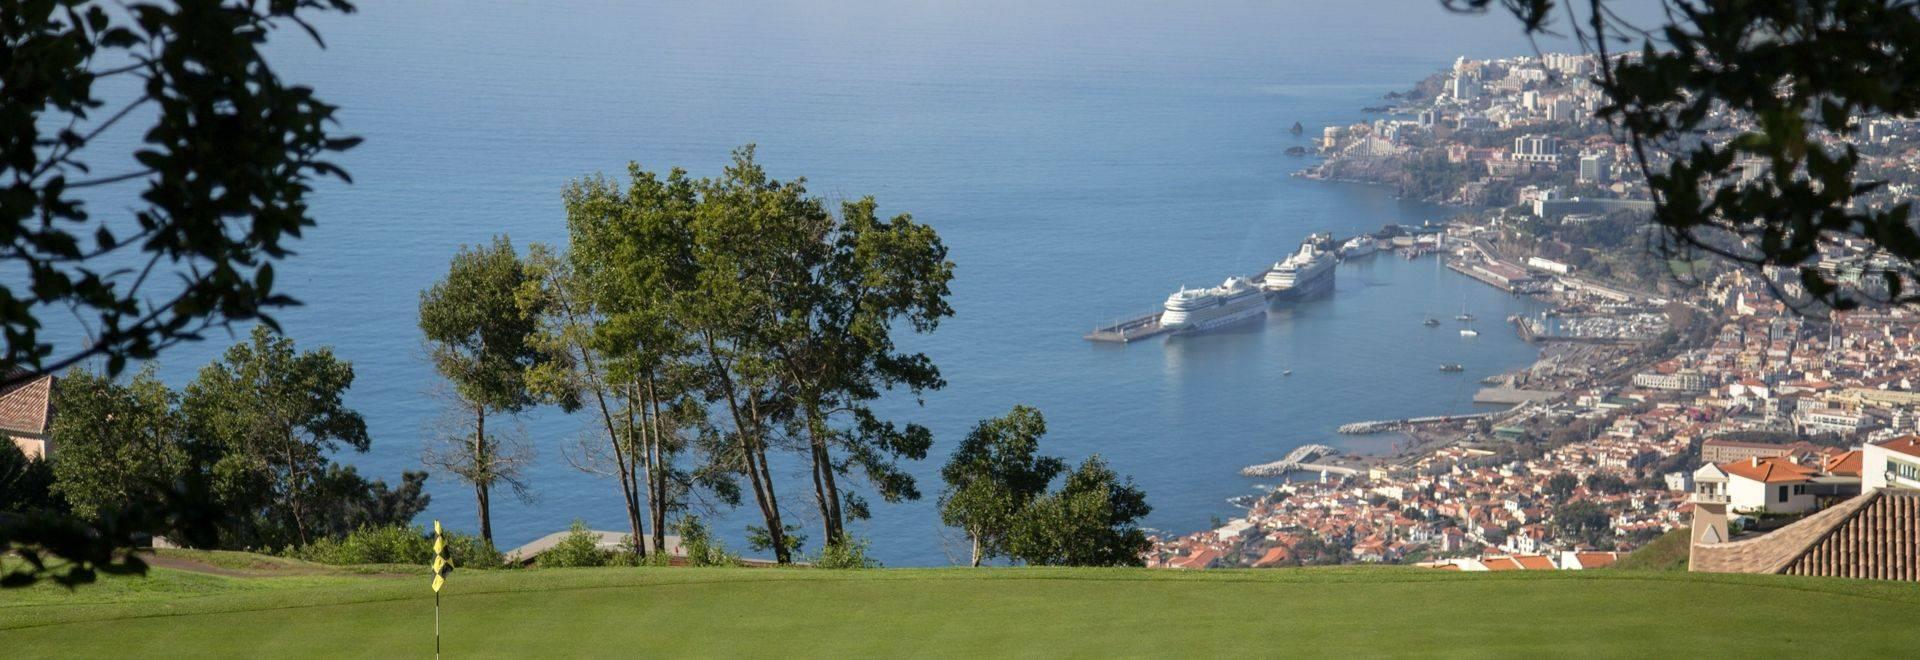 view-of-funchal-from-palheiro-golf_45949281282_o.jpg